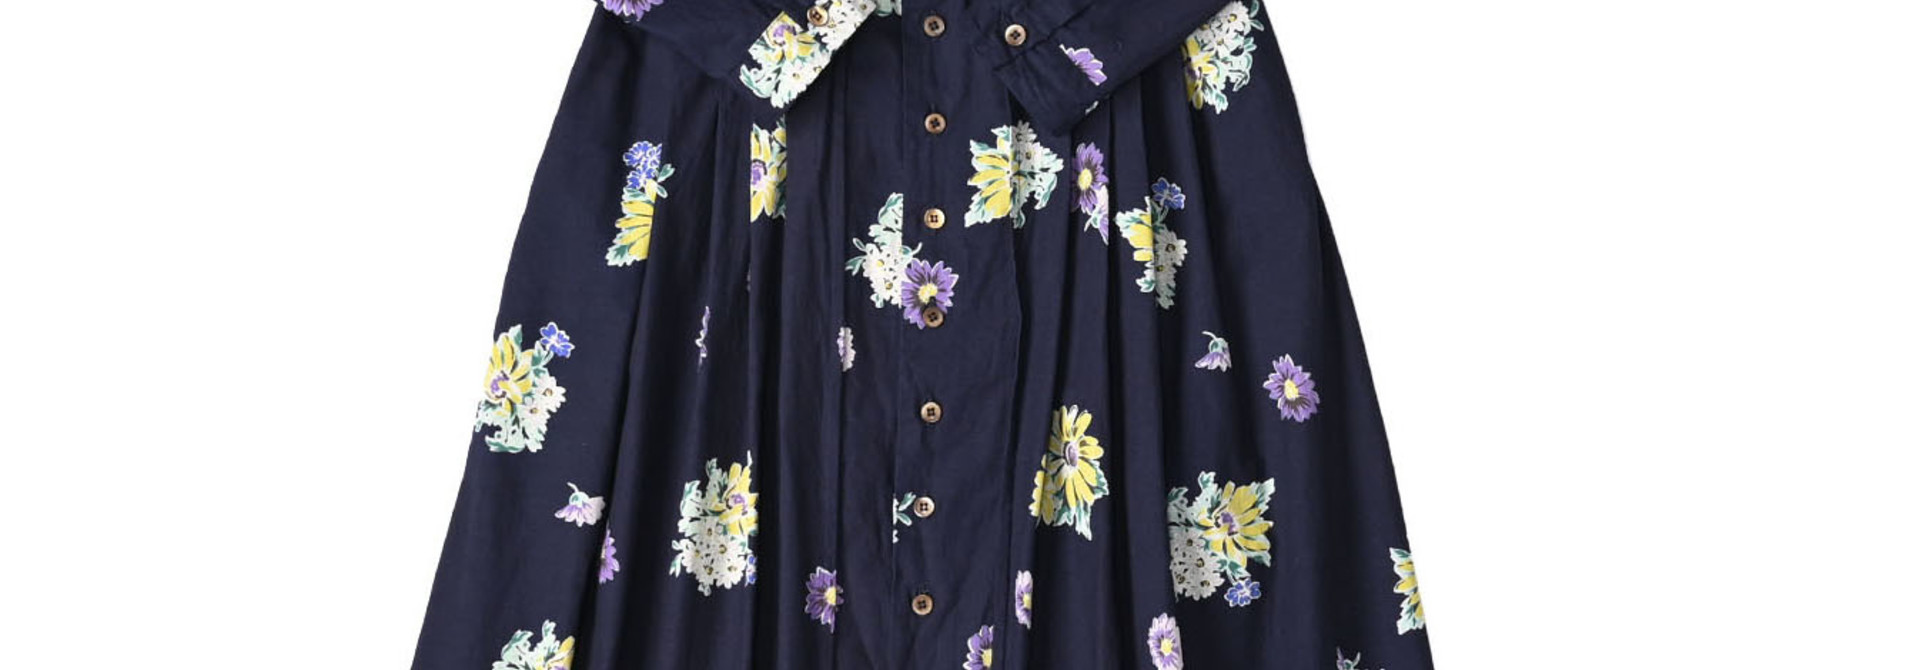 Indigo Margaret Print Dress